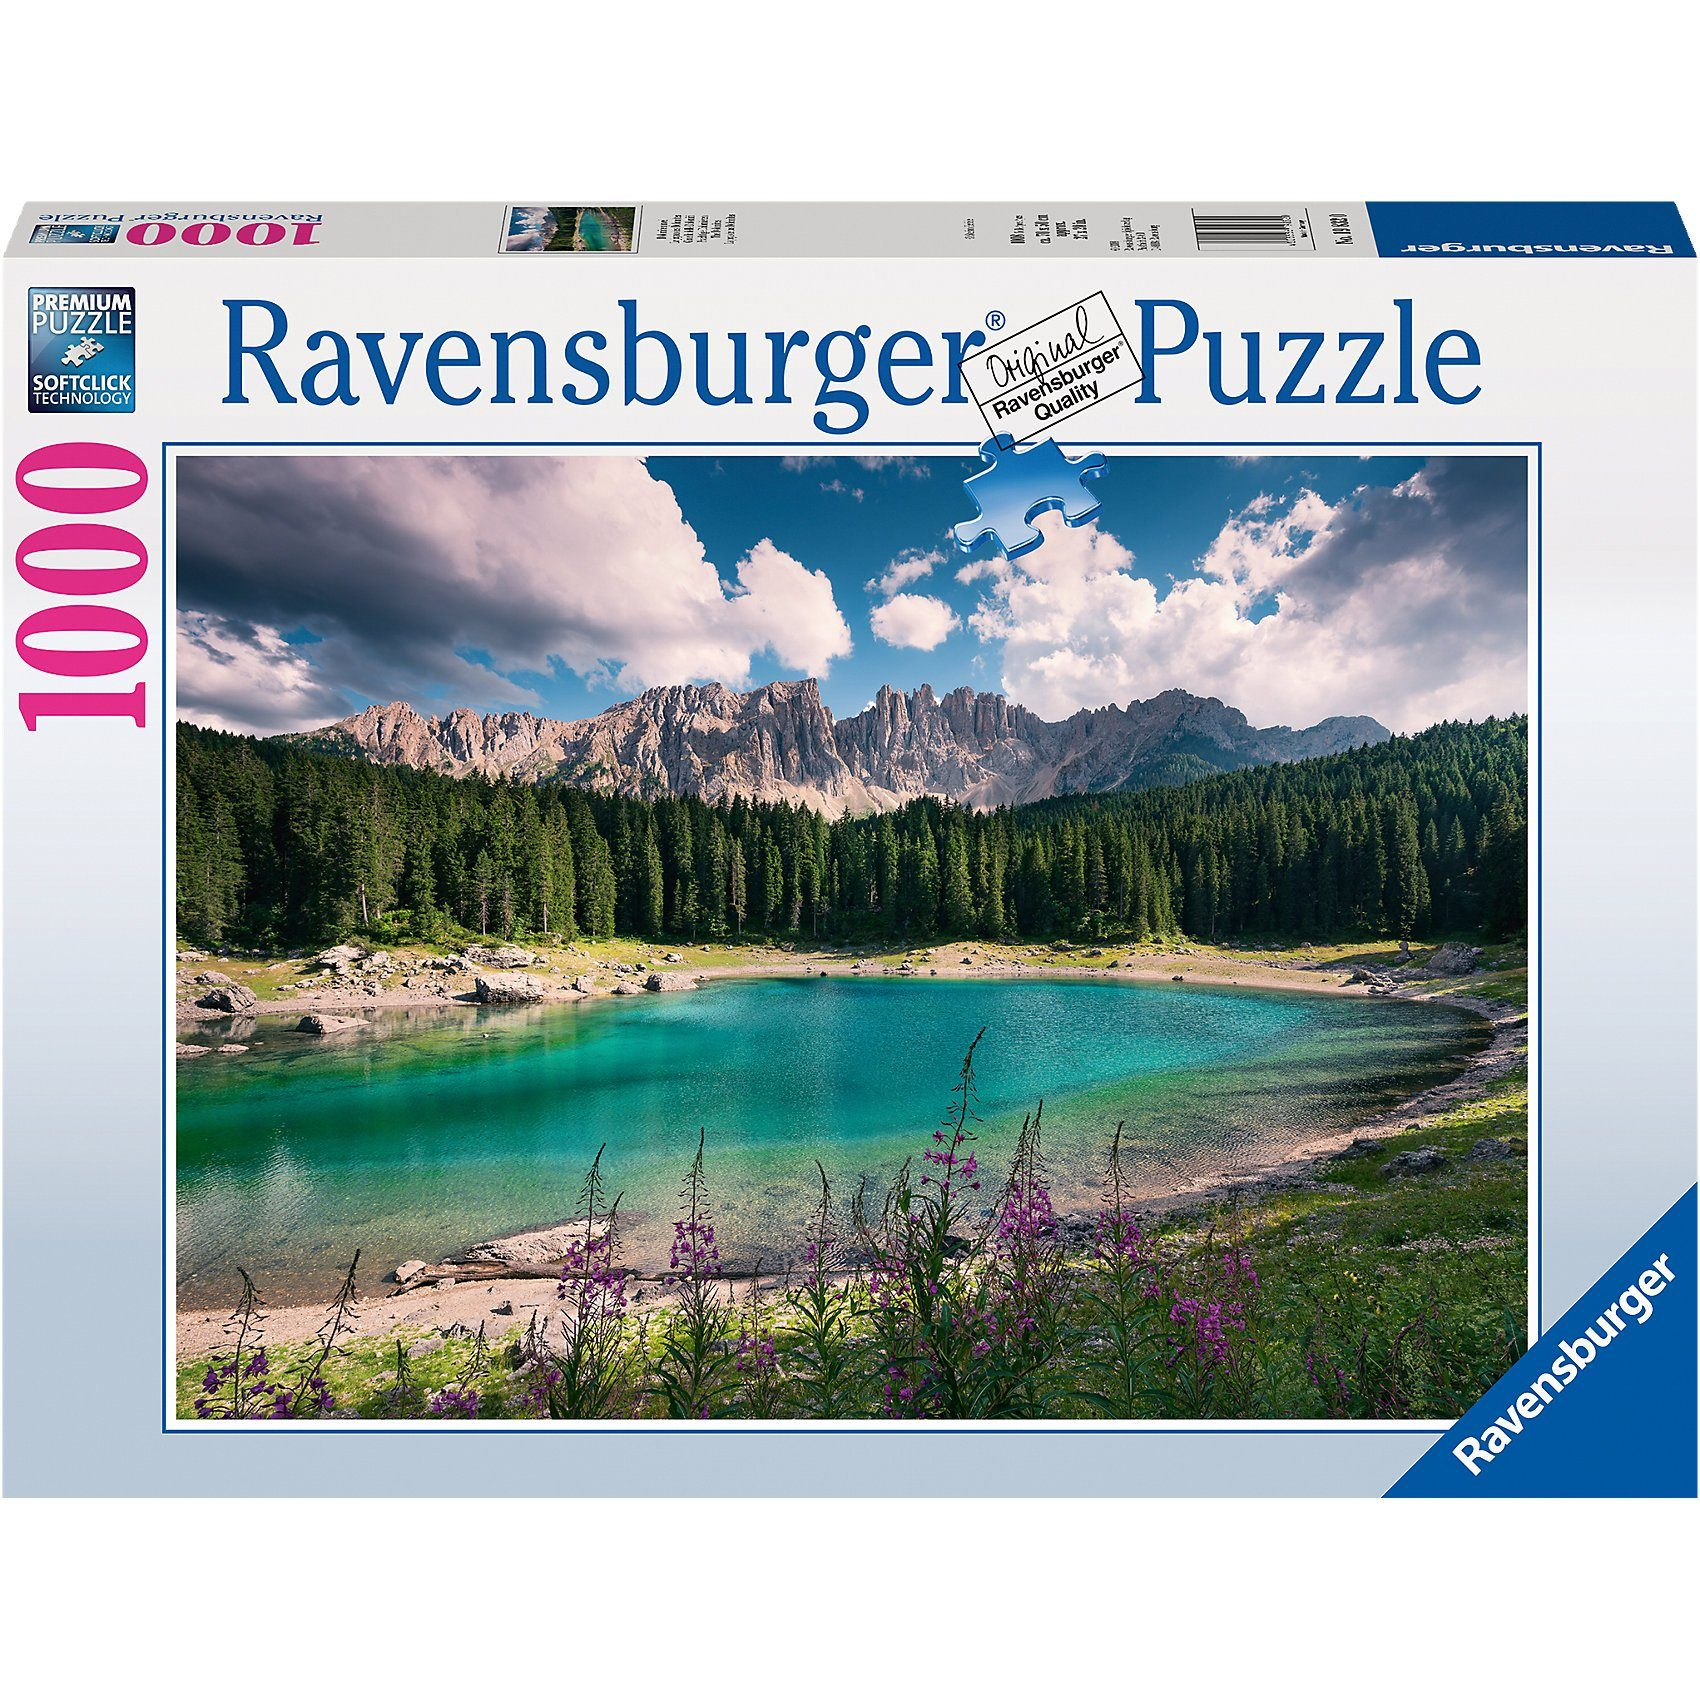 Ravensburger Puzzle 1000 Teile, 70x50 cm, Dolomitenjuwel